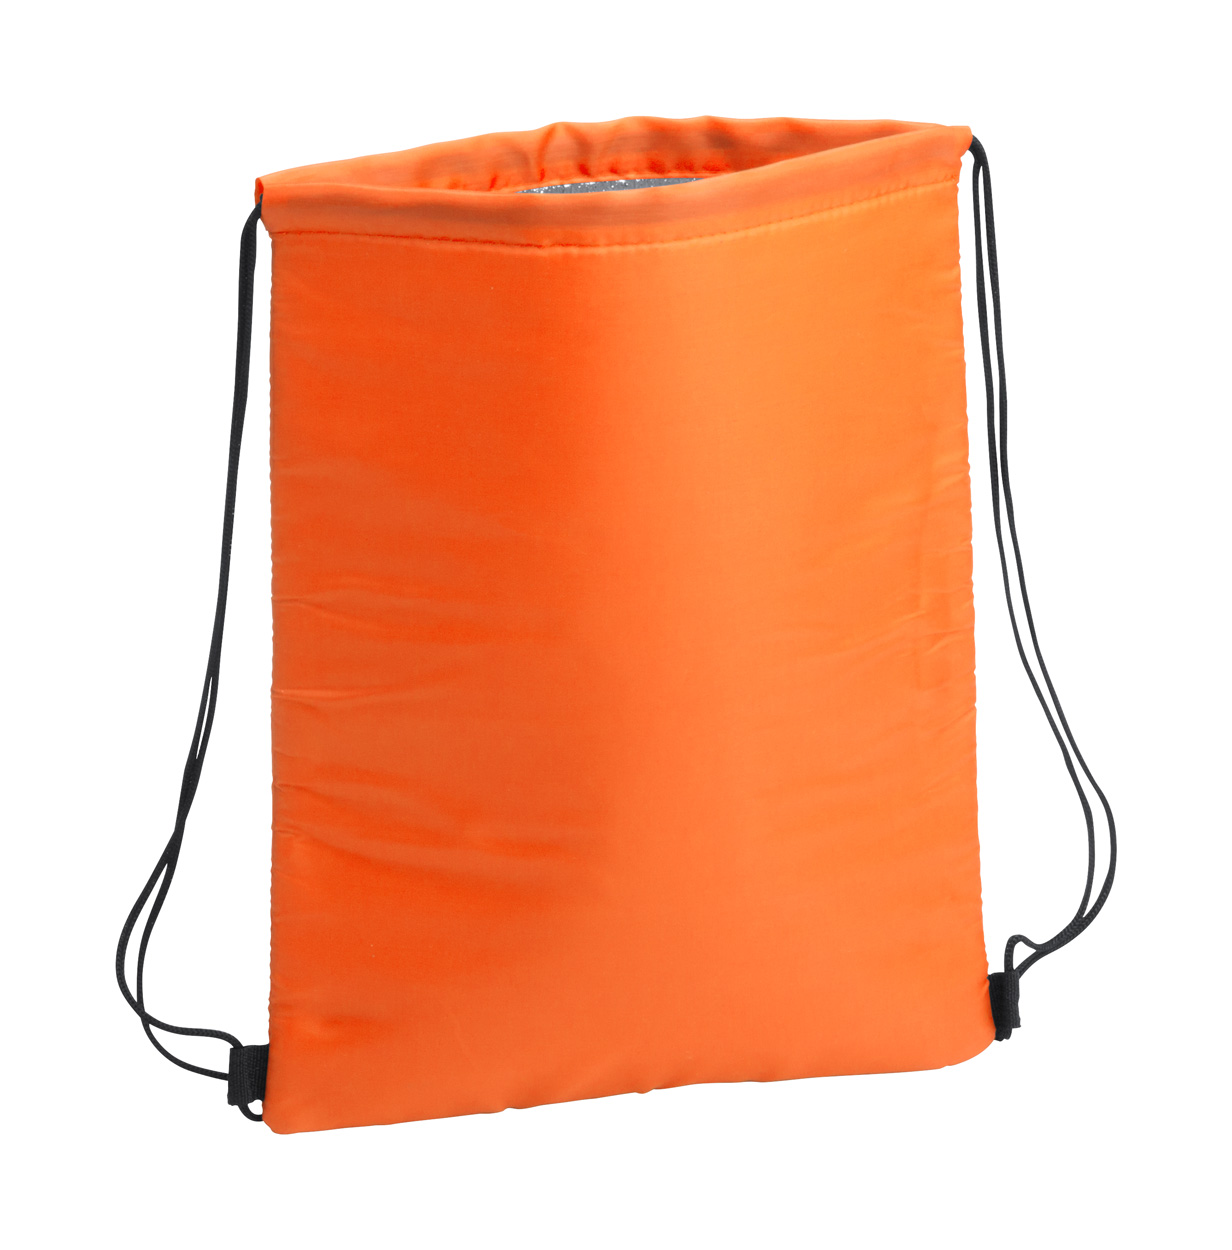 Nipex cooler bag